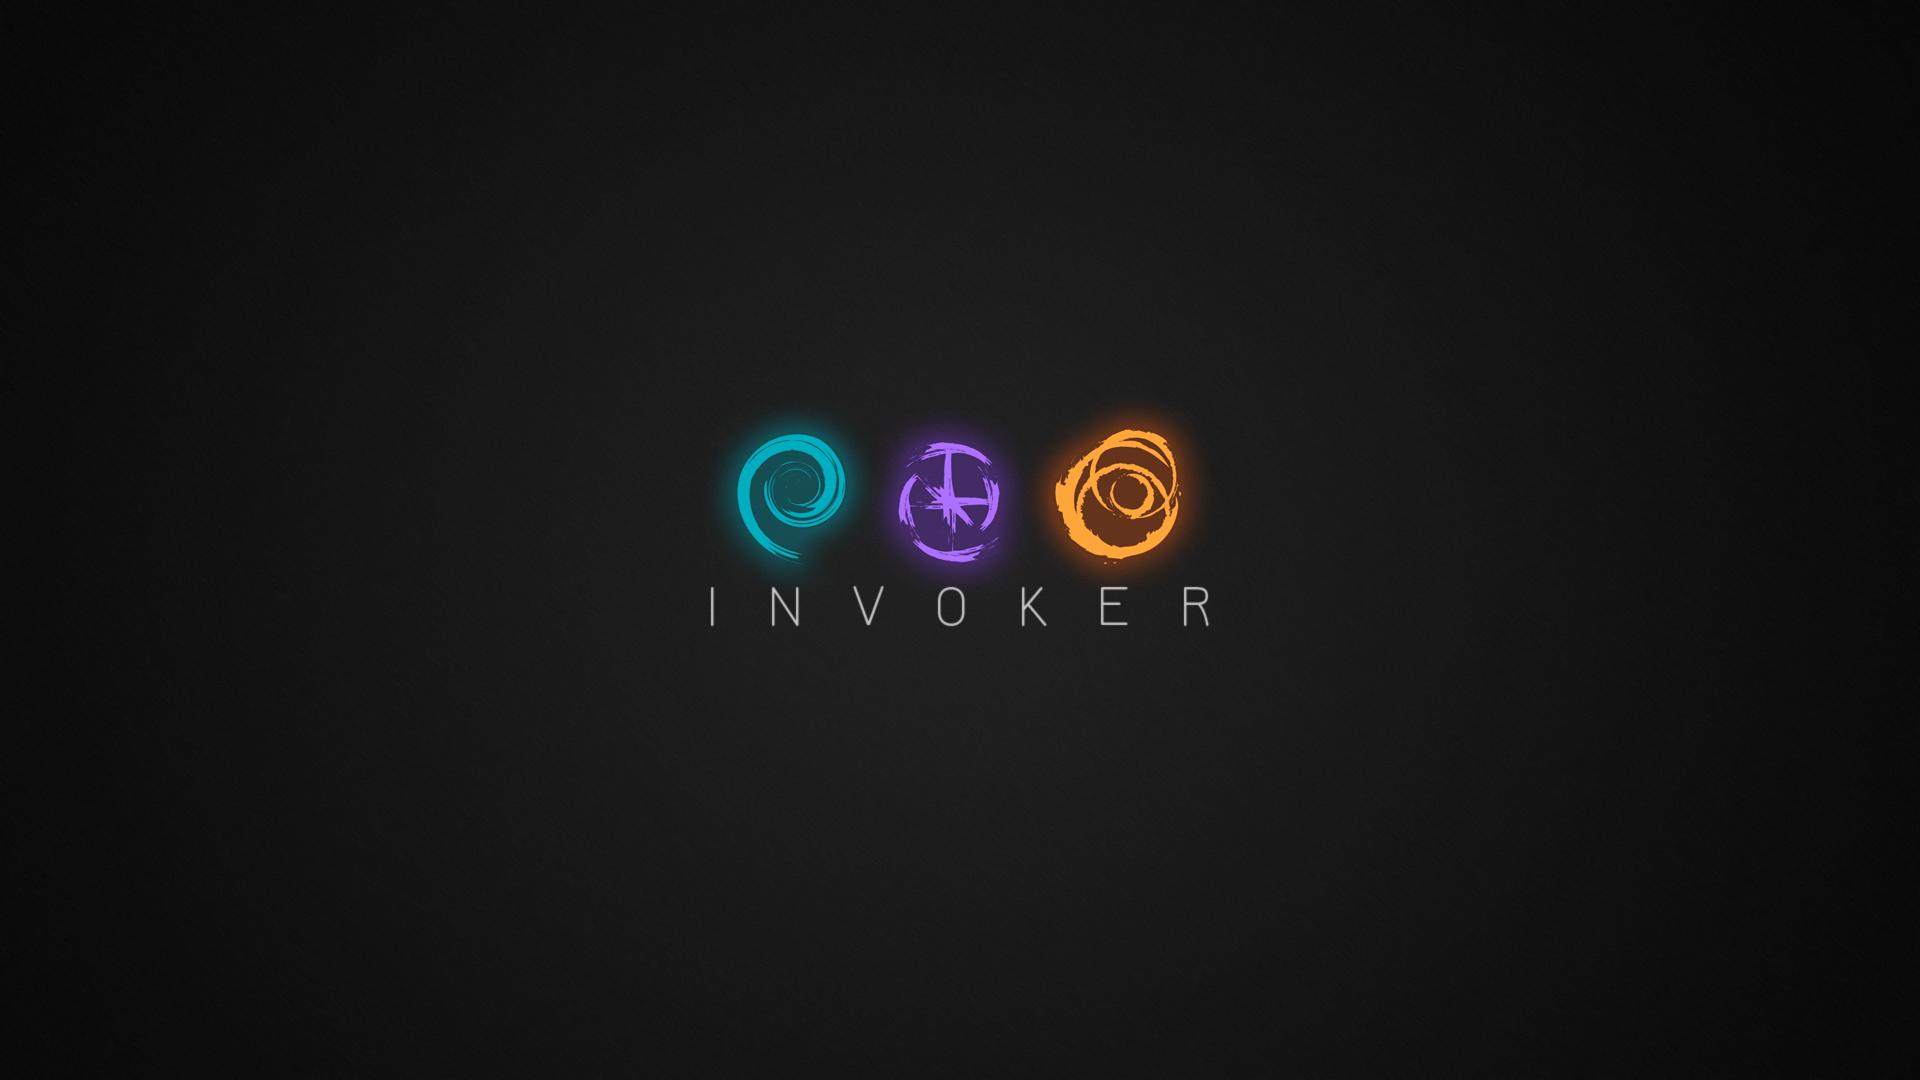 Hd Invoker Wallpaper Hd Dota 2 On Windows Wallpaper Full Hd With